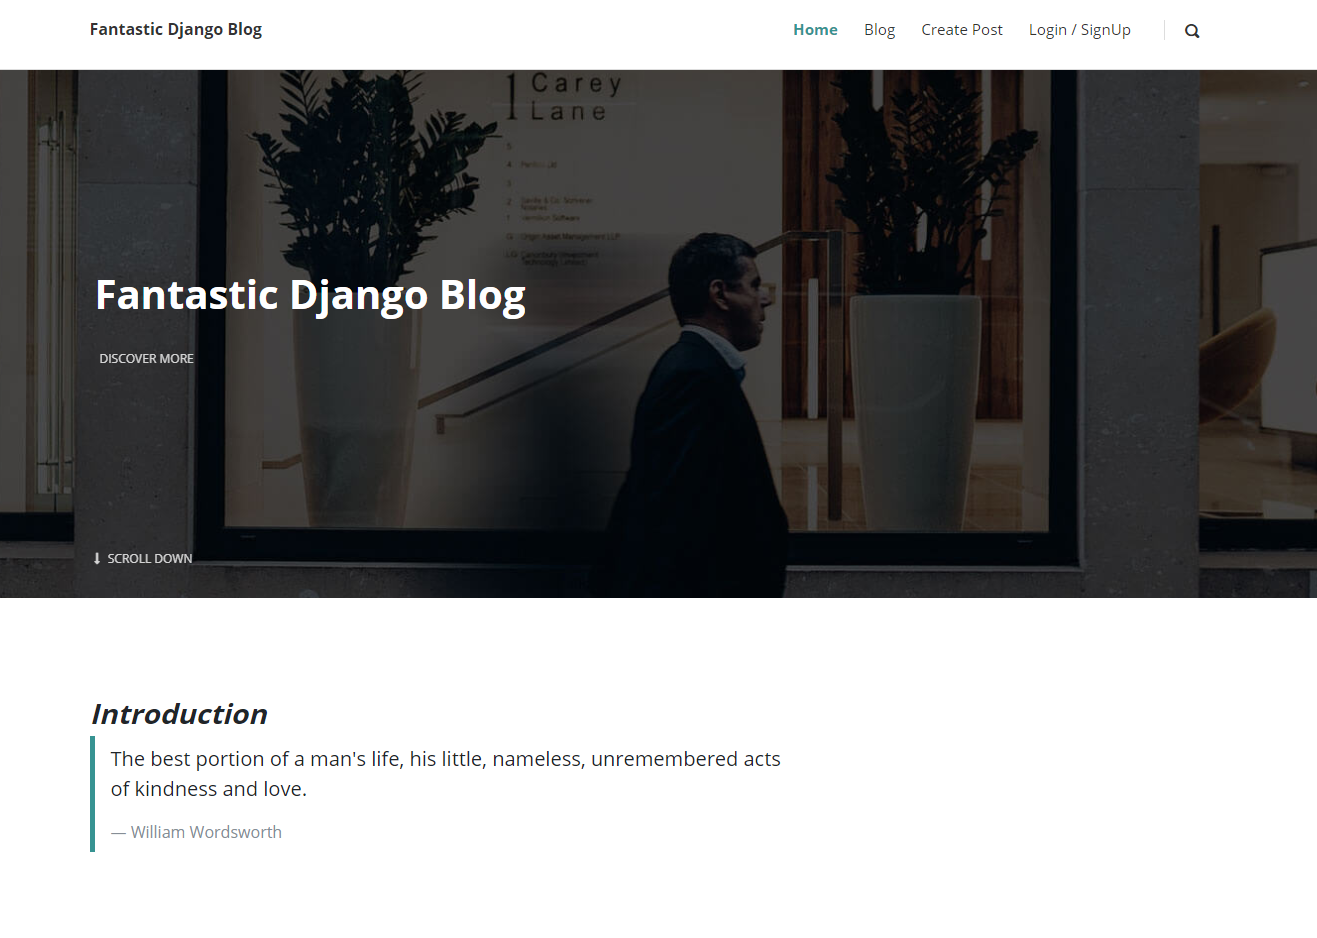 Fantastic Blog App made using Django Framework